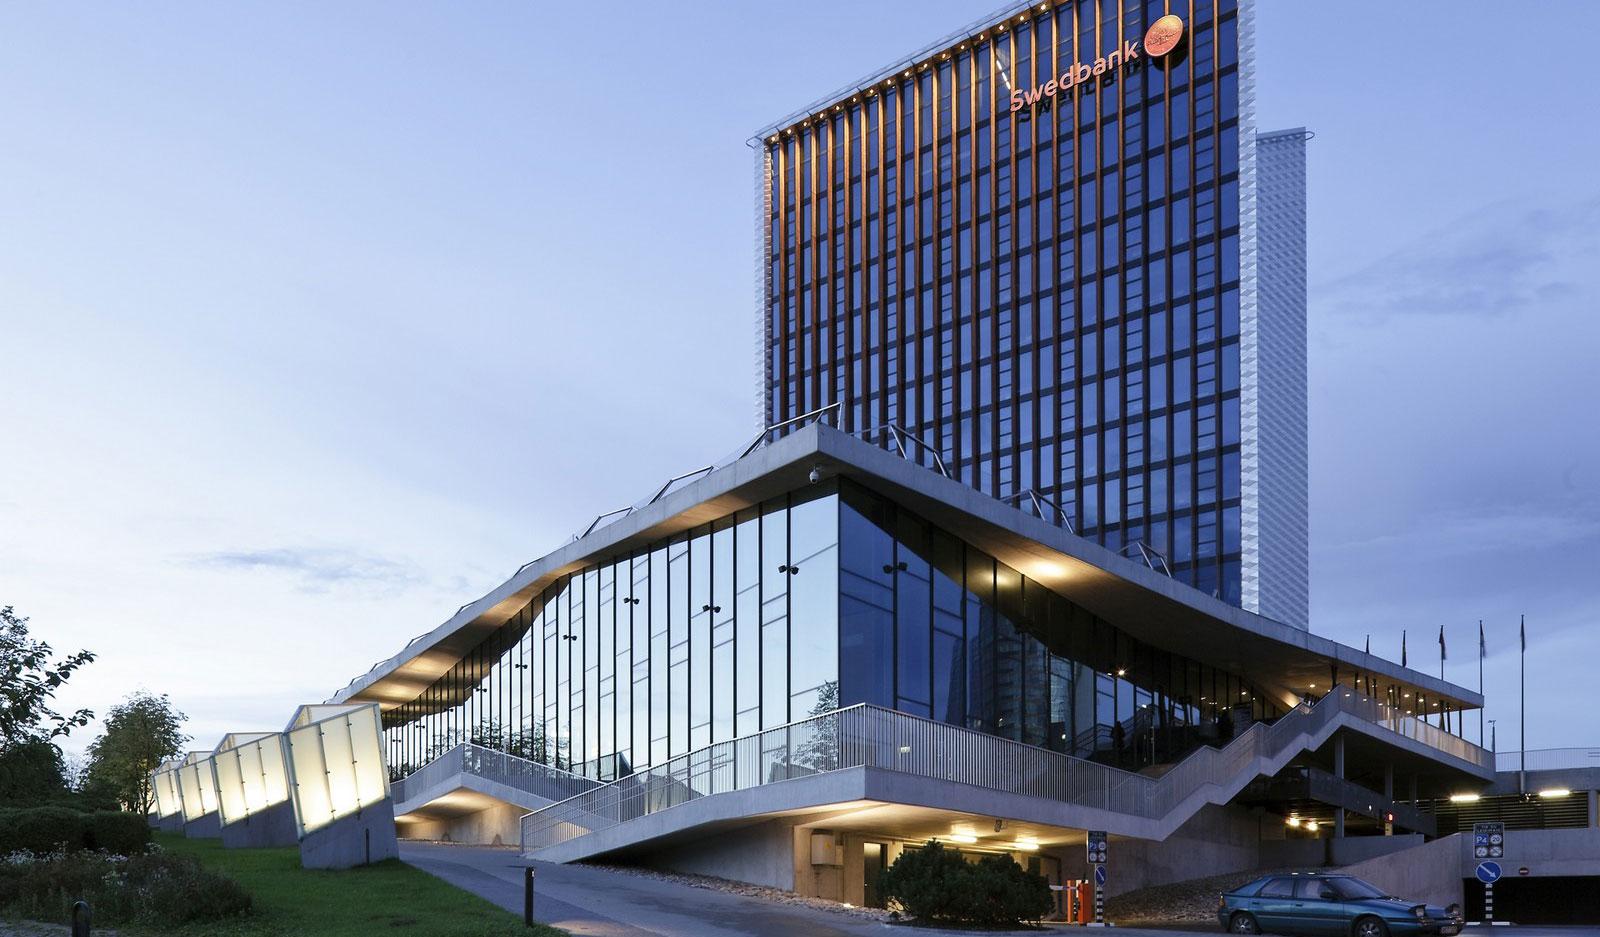 Swedbank, Vilnius, Lituanie